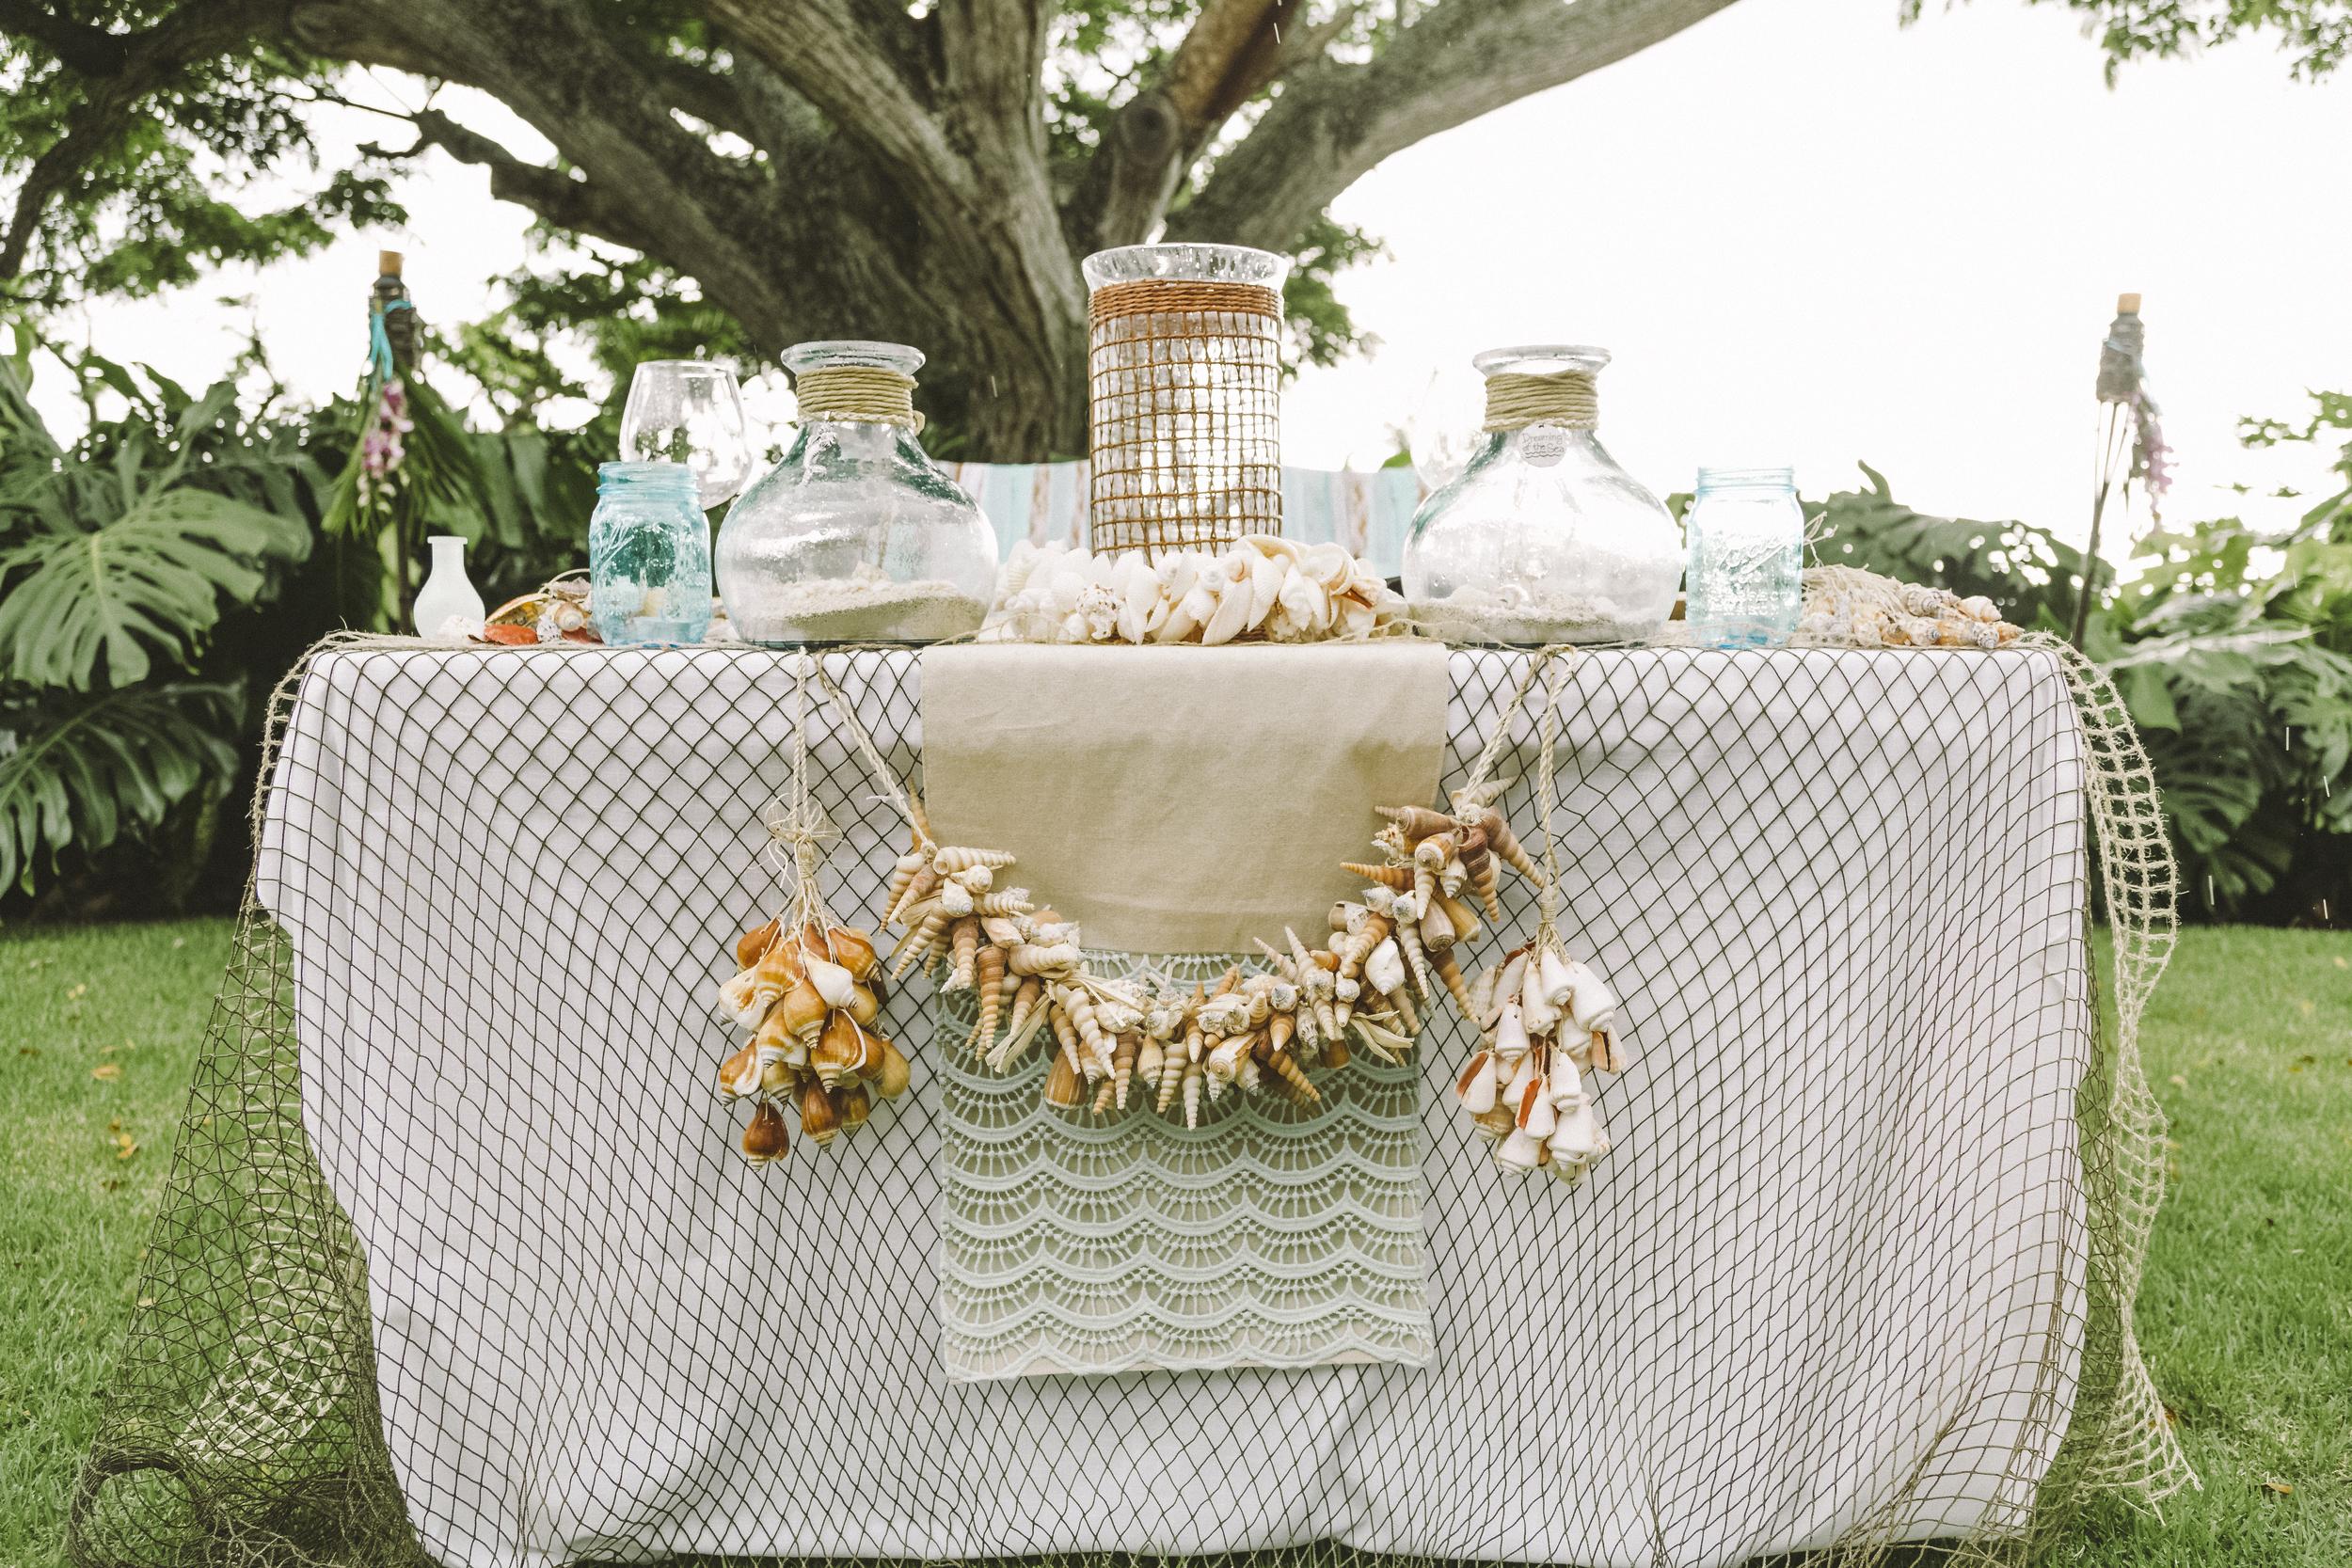 angie-diaz-photography-hawaii-wedding-photographer-kelli-jay-108.jpg